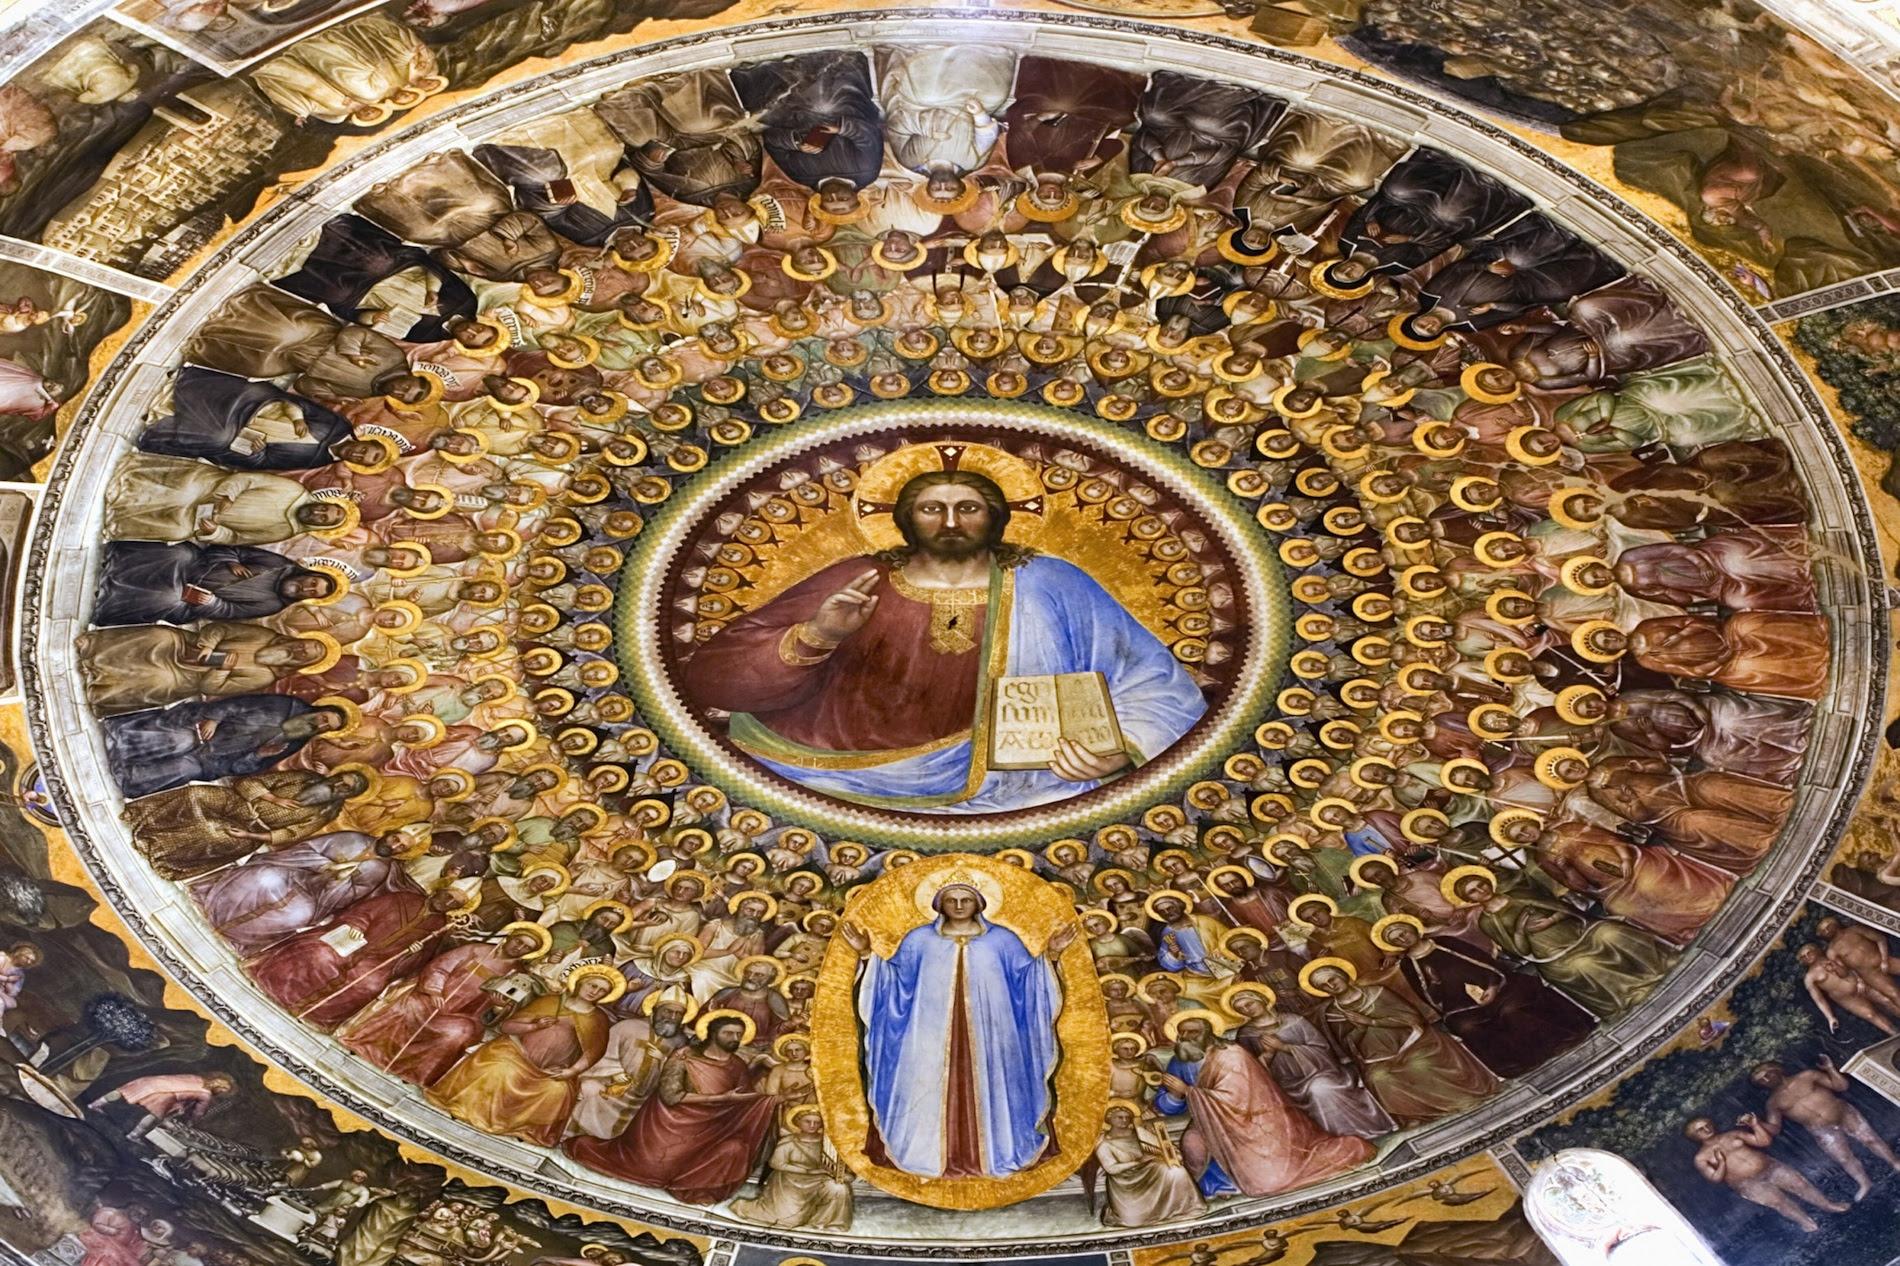 http://www.conciliarpost.com/wp-content/uploads/2015/01/Padua-Baptistry-Ceiling.jpg